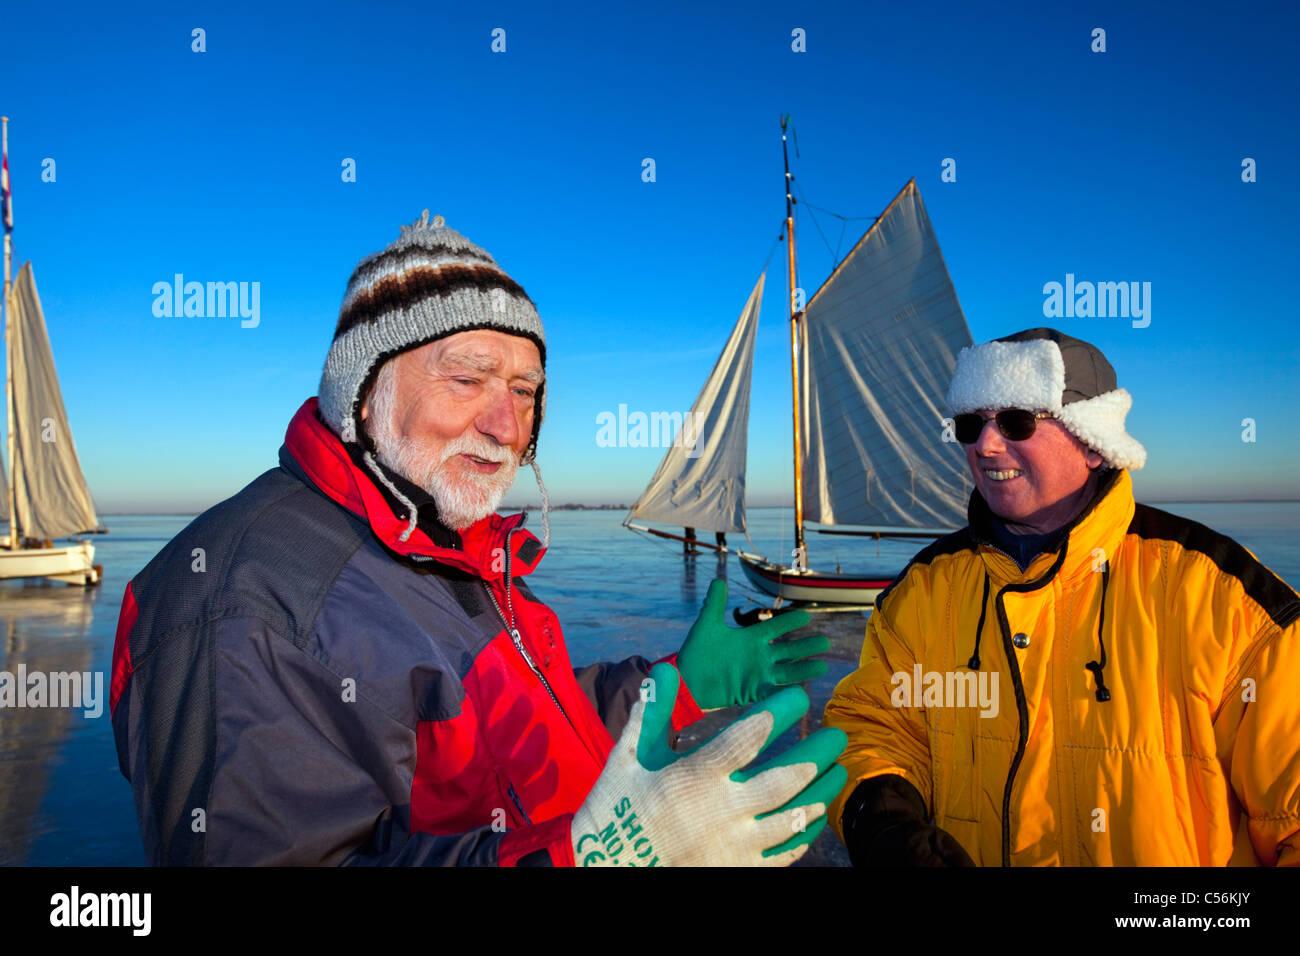 The Netherlands, Monnickendam. Ice sailing boats on frozen lake called Gouwzee. Captains talking. - Stock Image